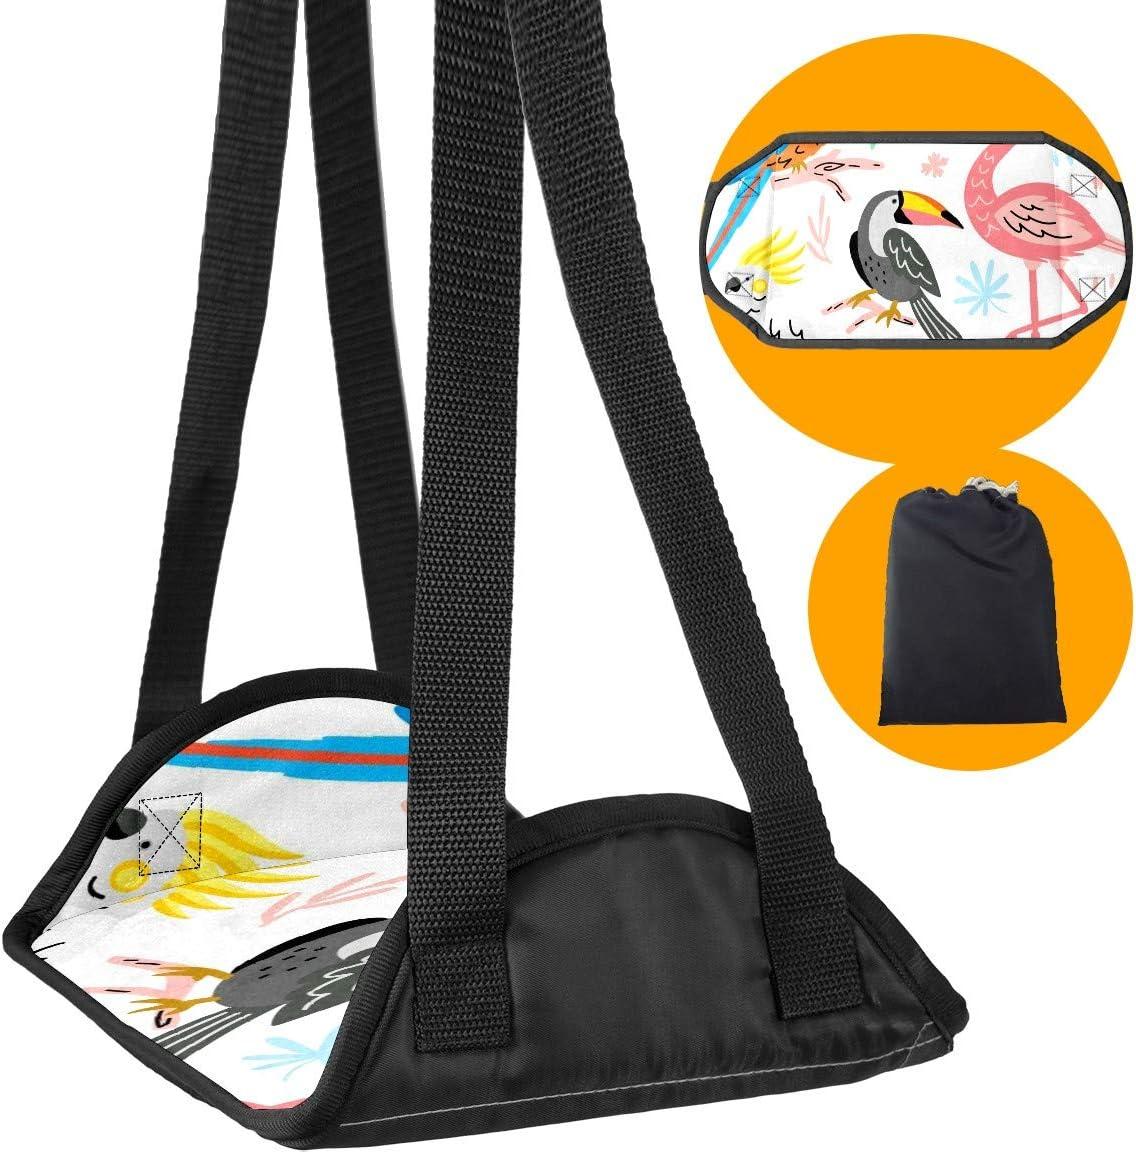 Purchase Foot Hammock Desk Footrest Hanger,Birds Mail order cheap Ad Portable Comfy